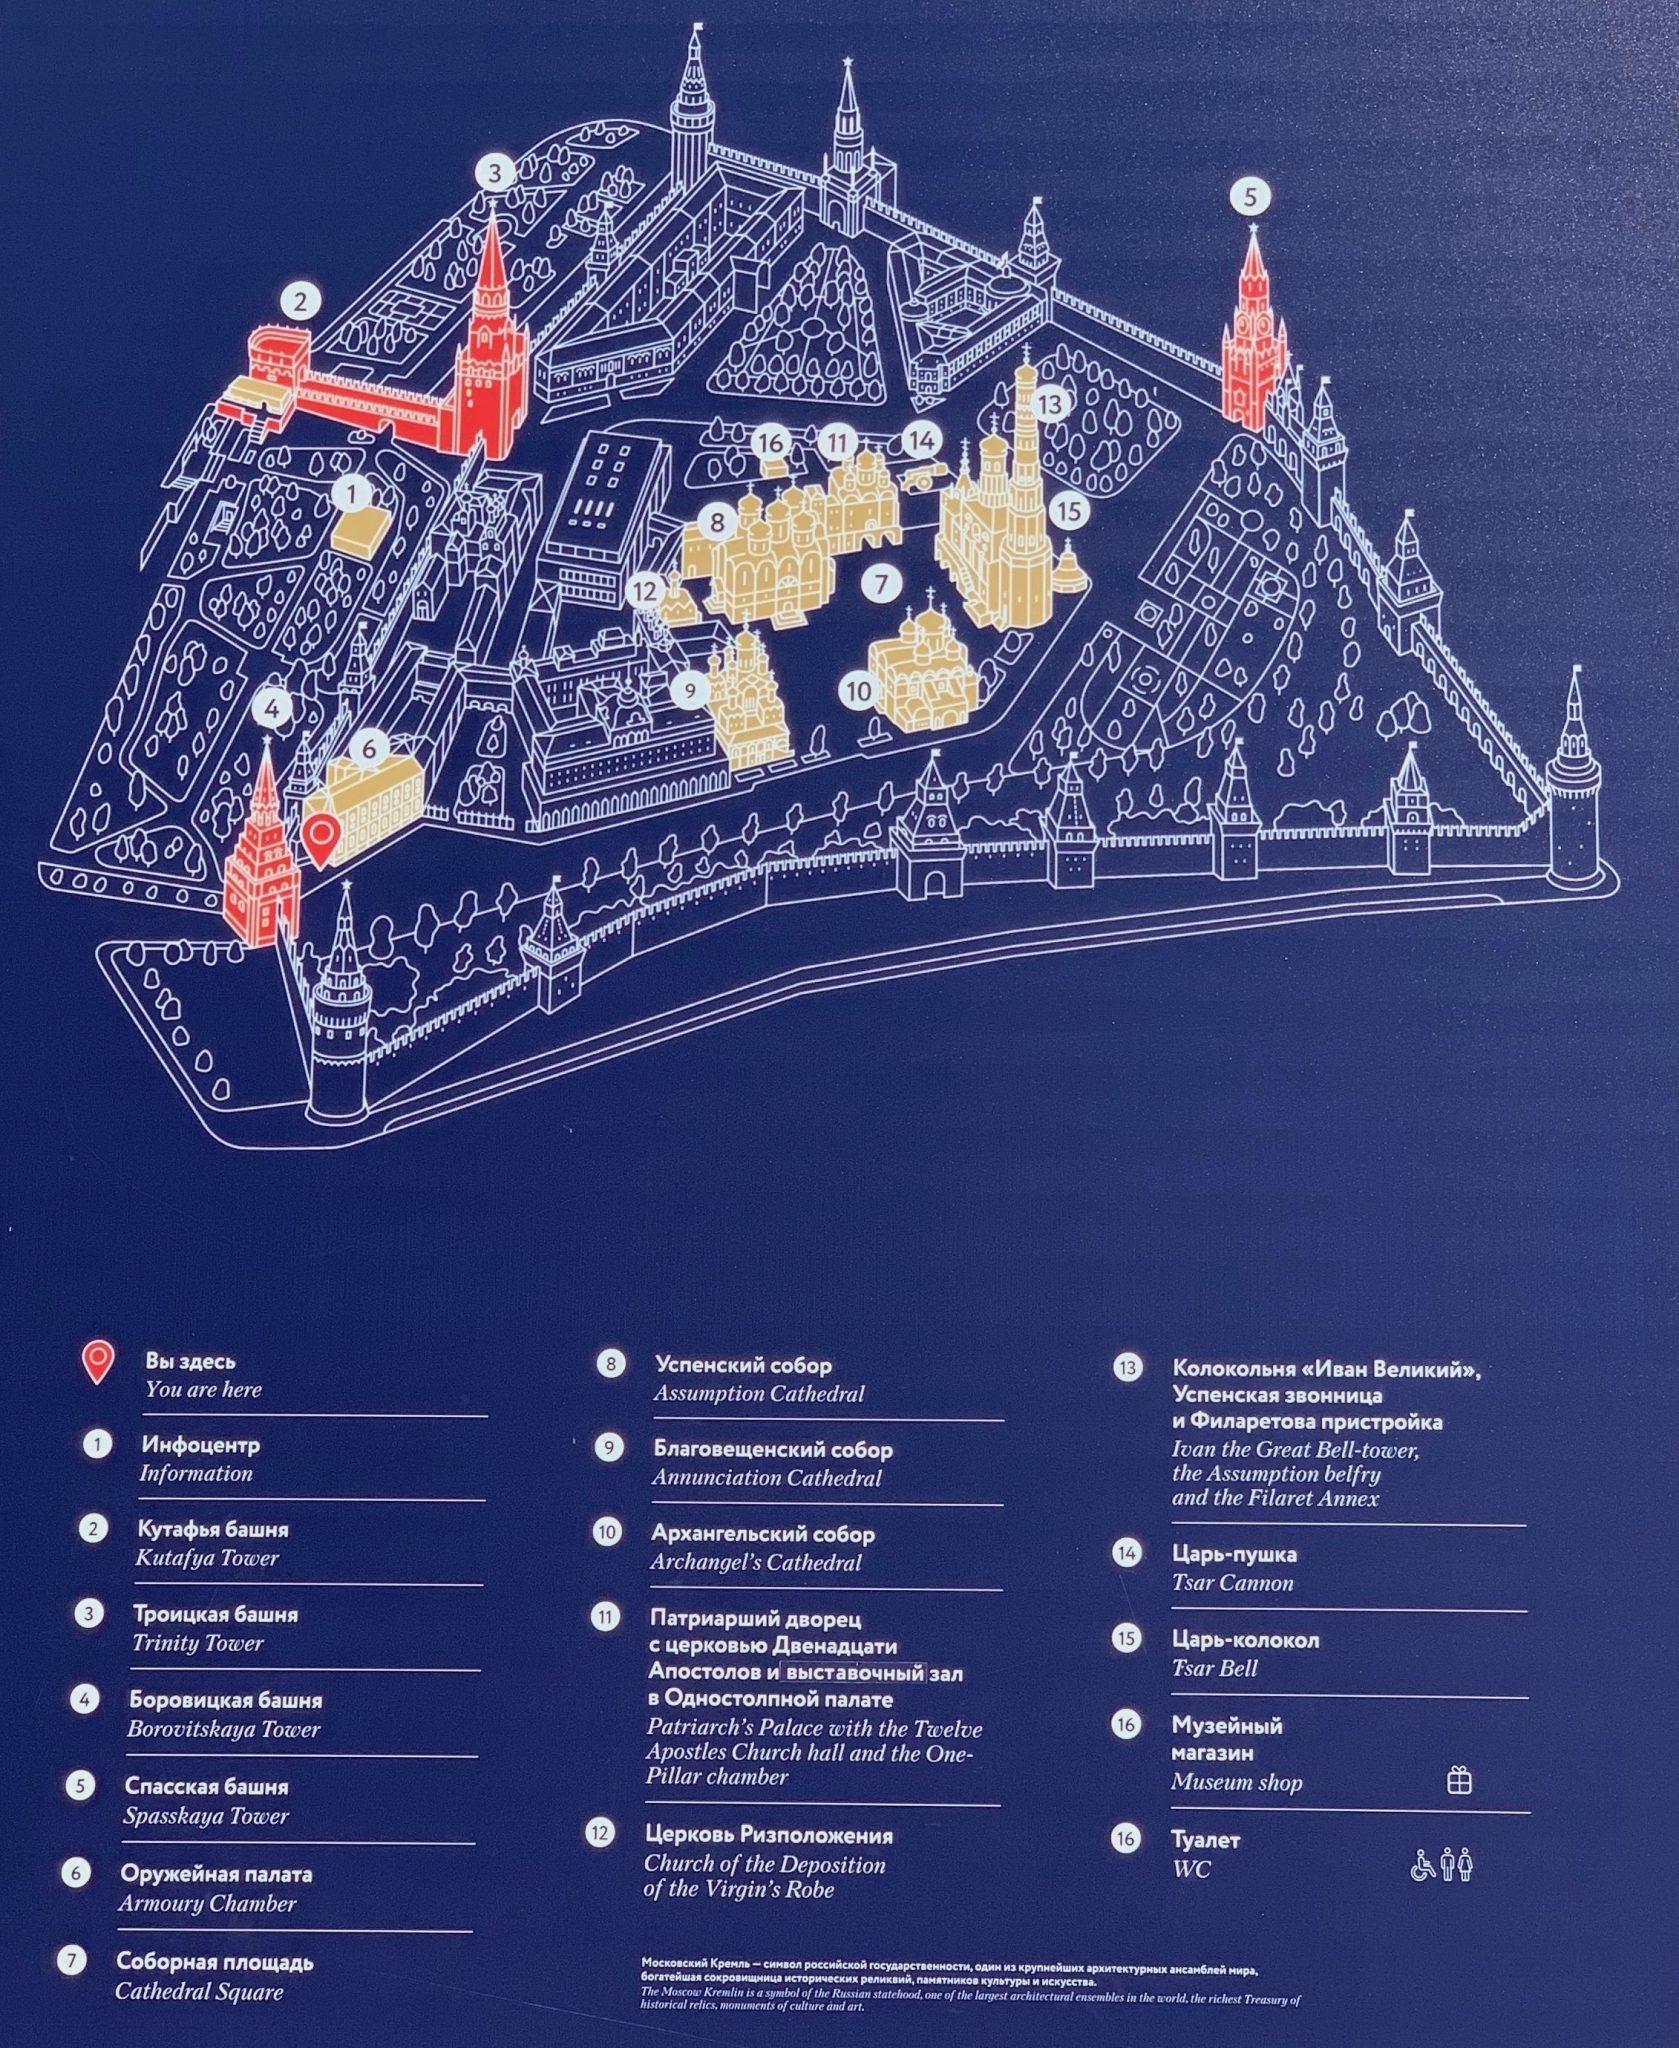 Map of the Kremlin